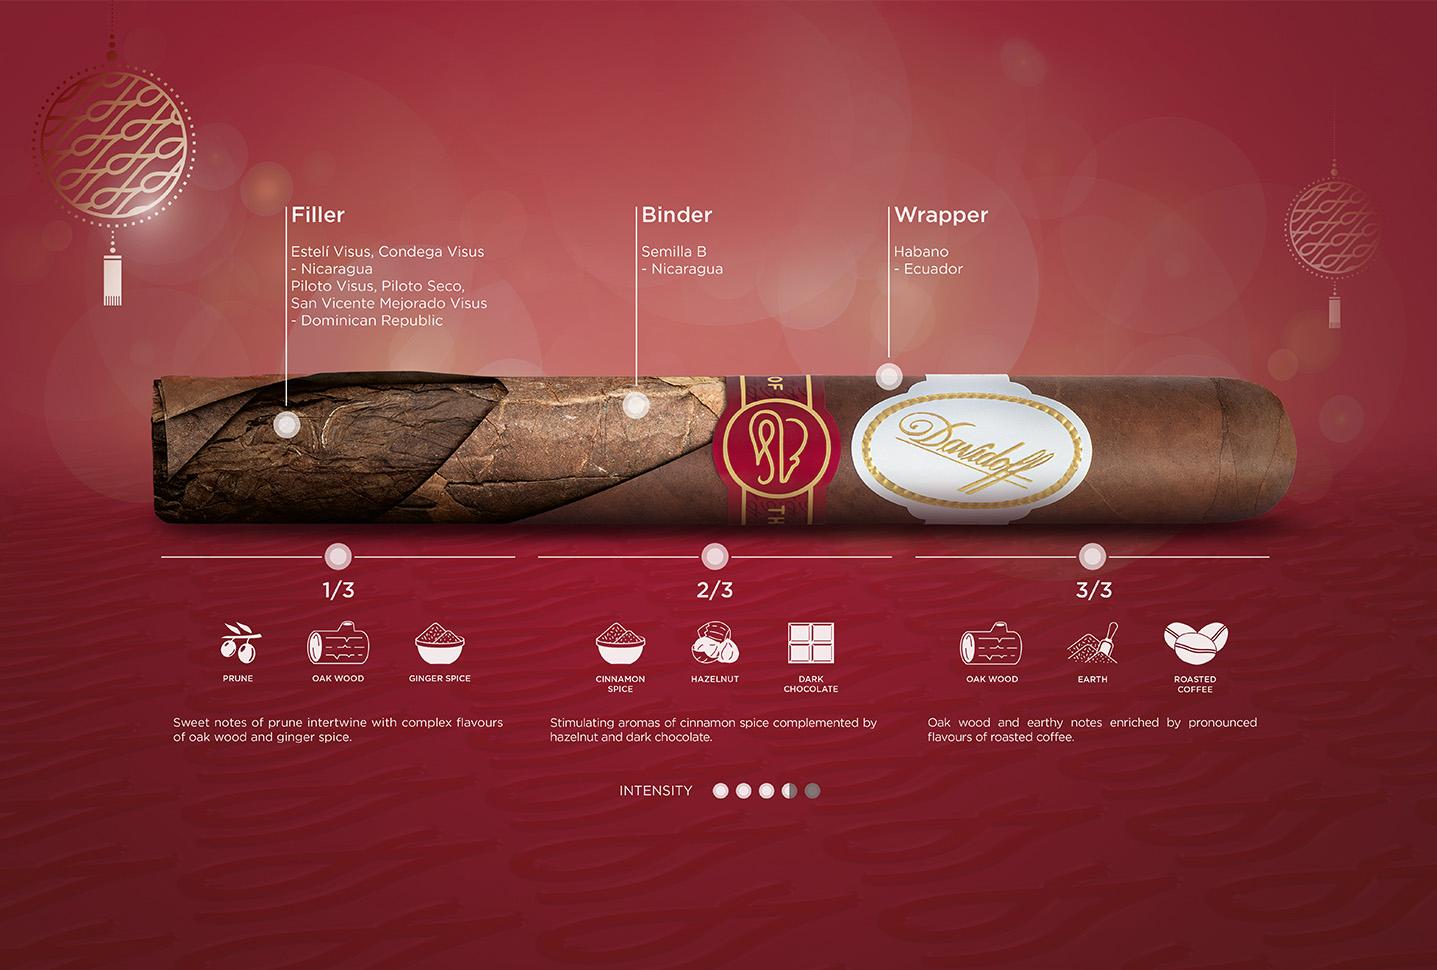 Taste breakdown of the Davidoff Year of the Rat 2020 cigars